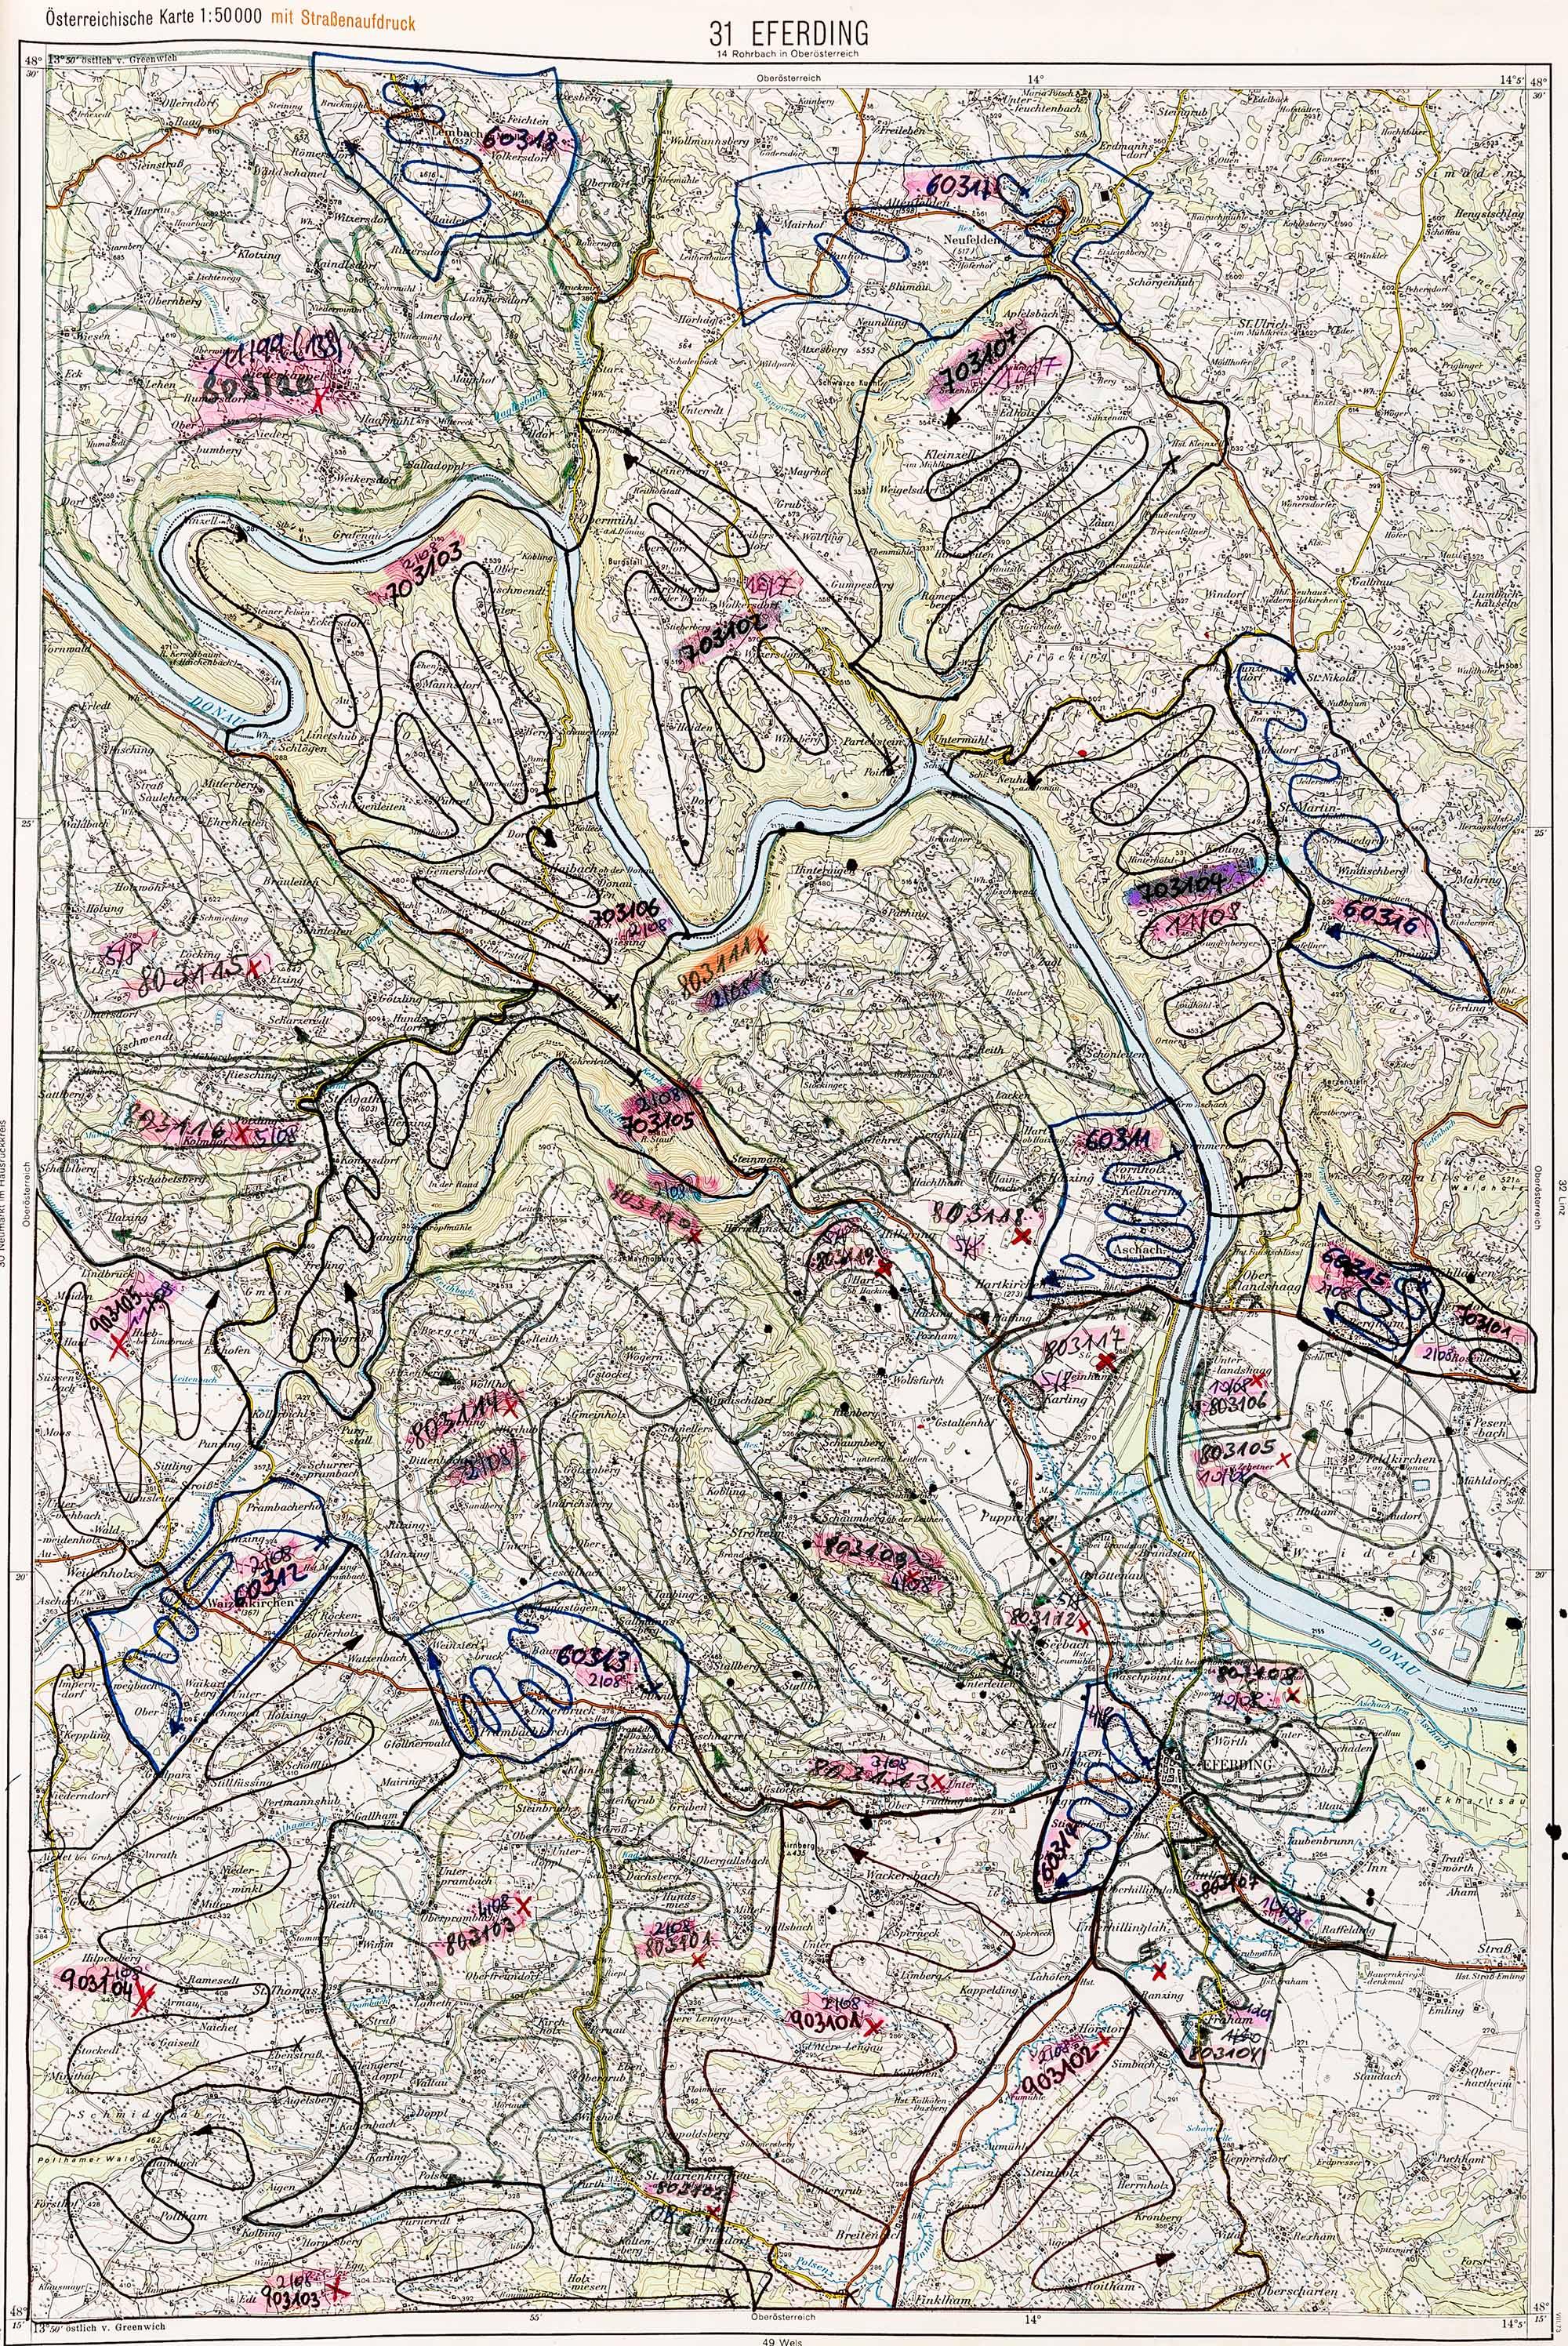 1975-1979 Karte 031